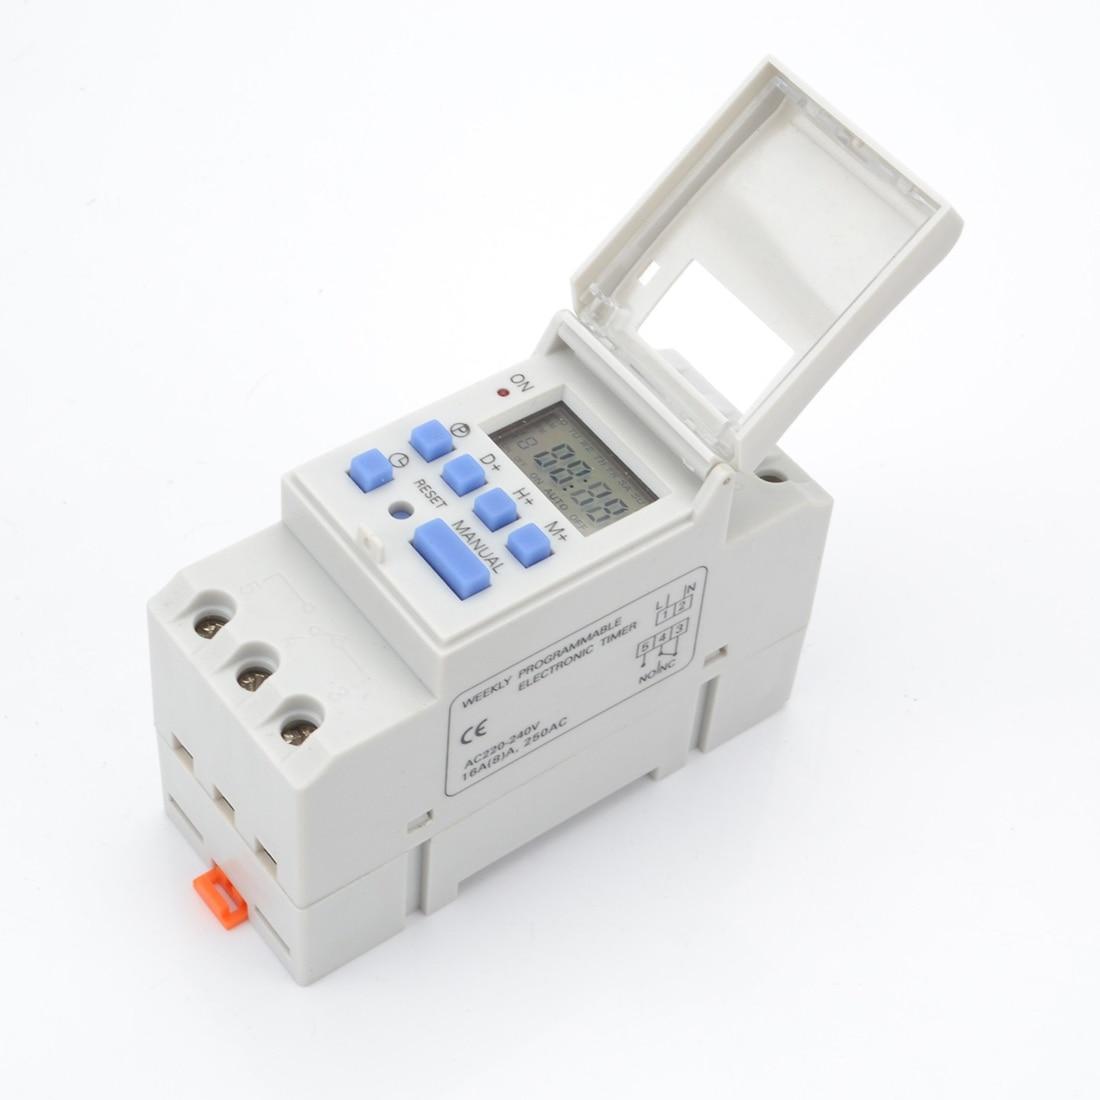 1pc Digital Programmable Timer Switch AC 220V / 110V DC 12V 16A Temporizador Din Rail Timer Switch brand new and high quality